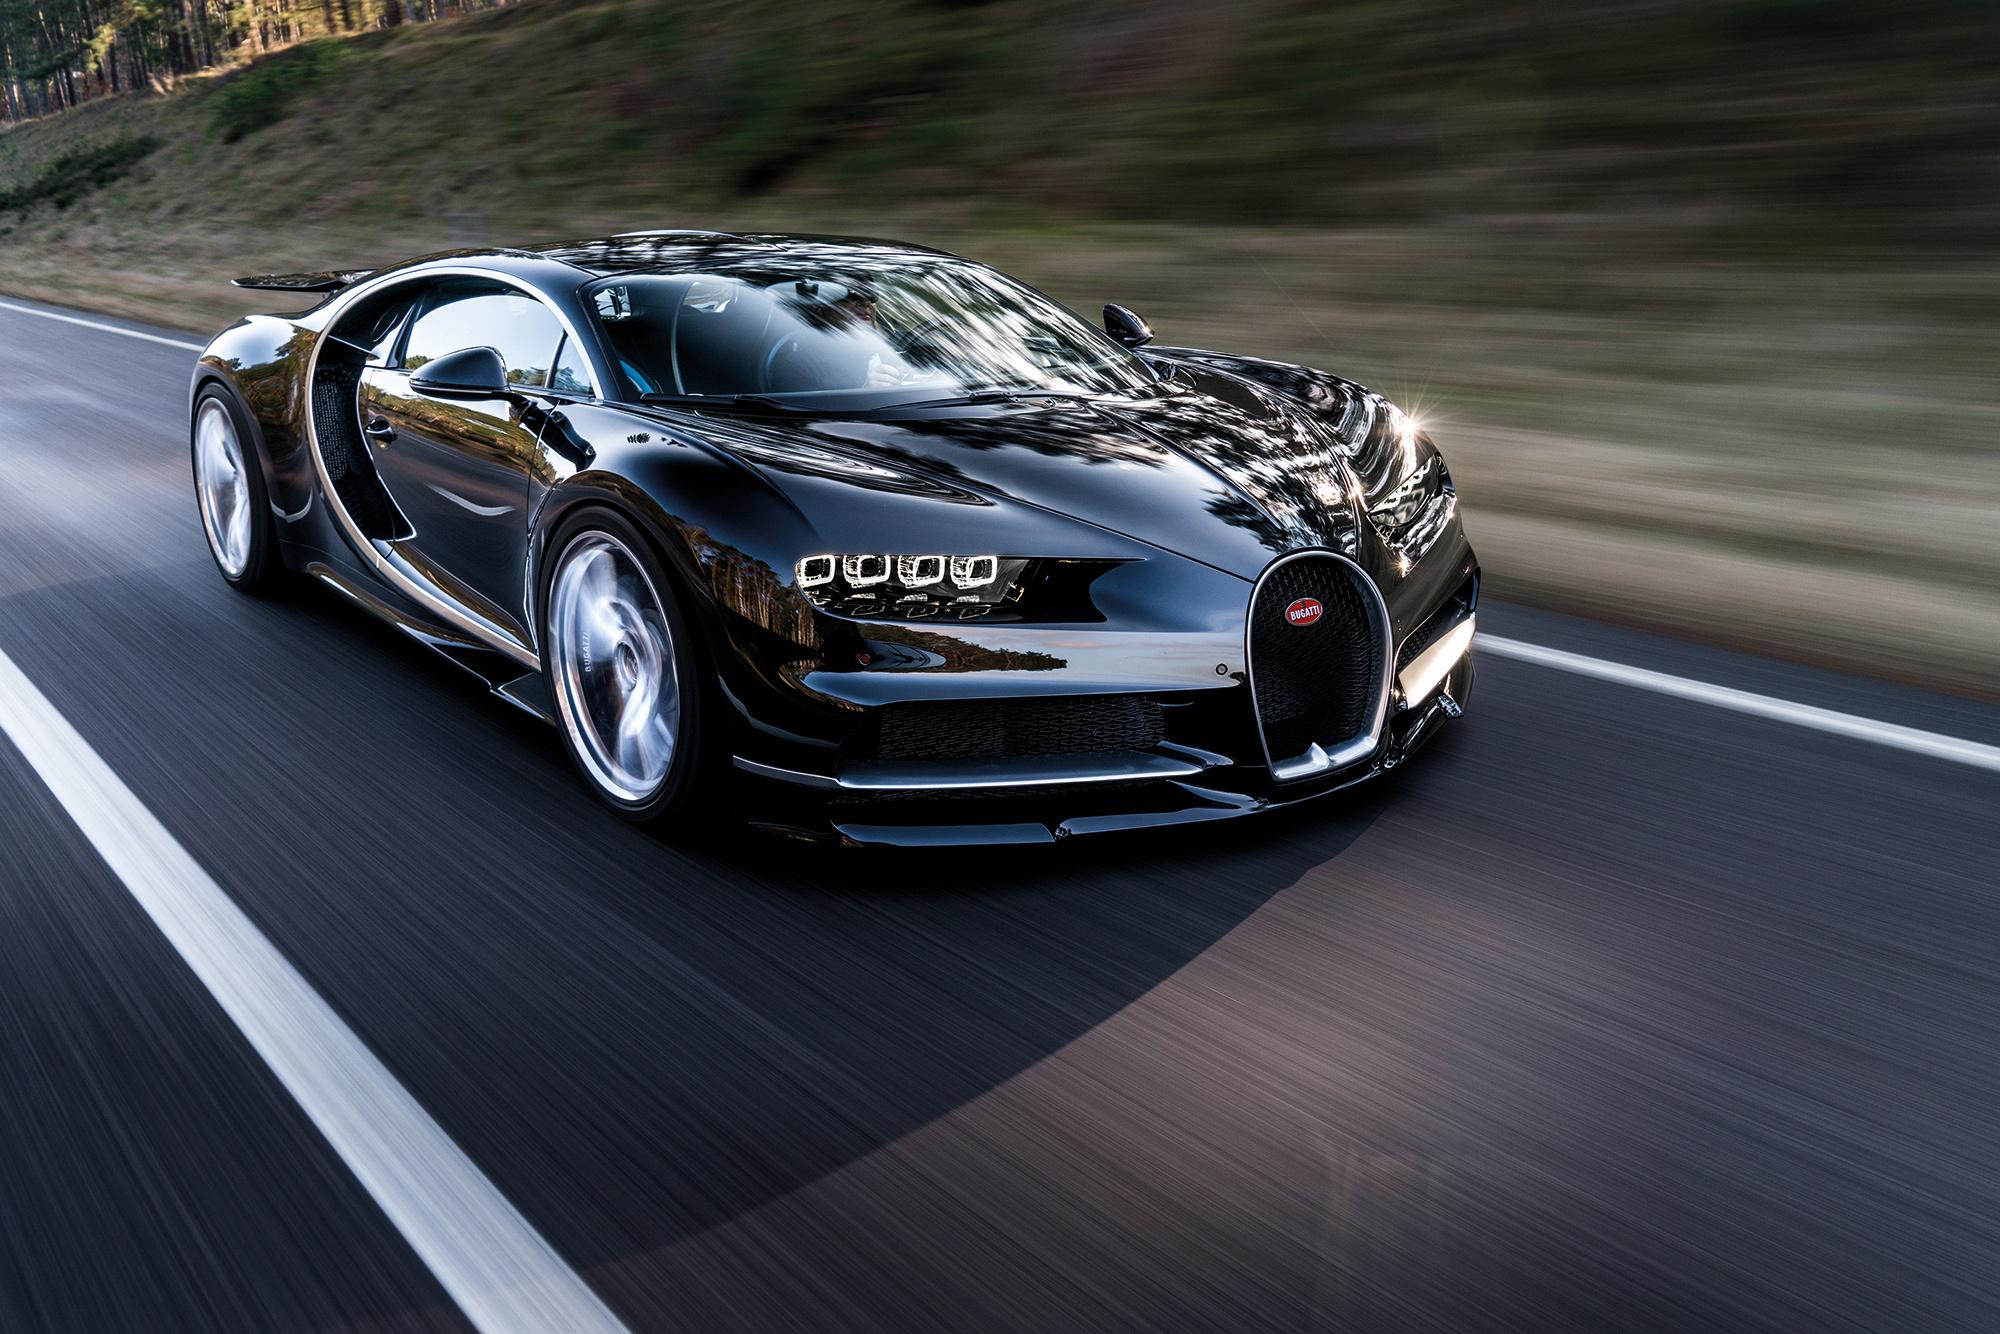 Гиперкар Bugatti Chiron идёт на мировой рекорд скорости